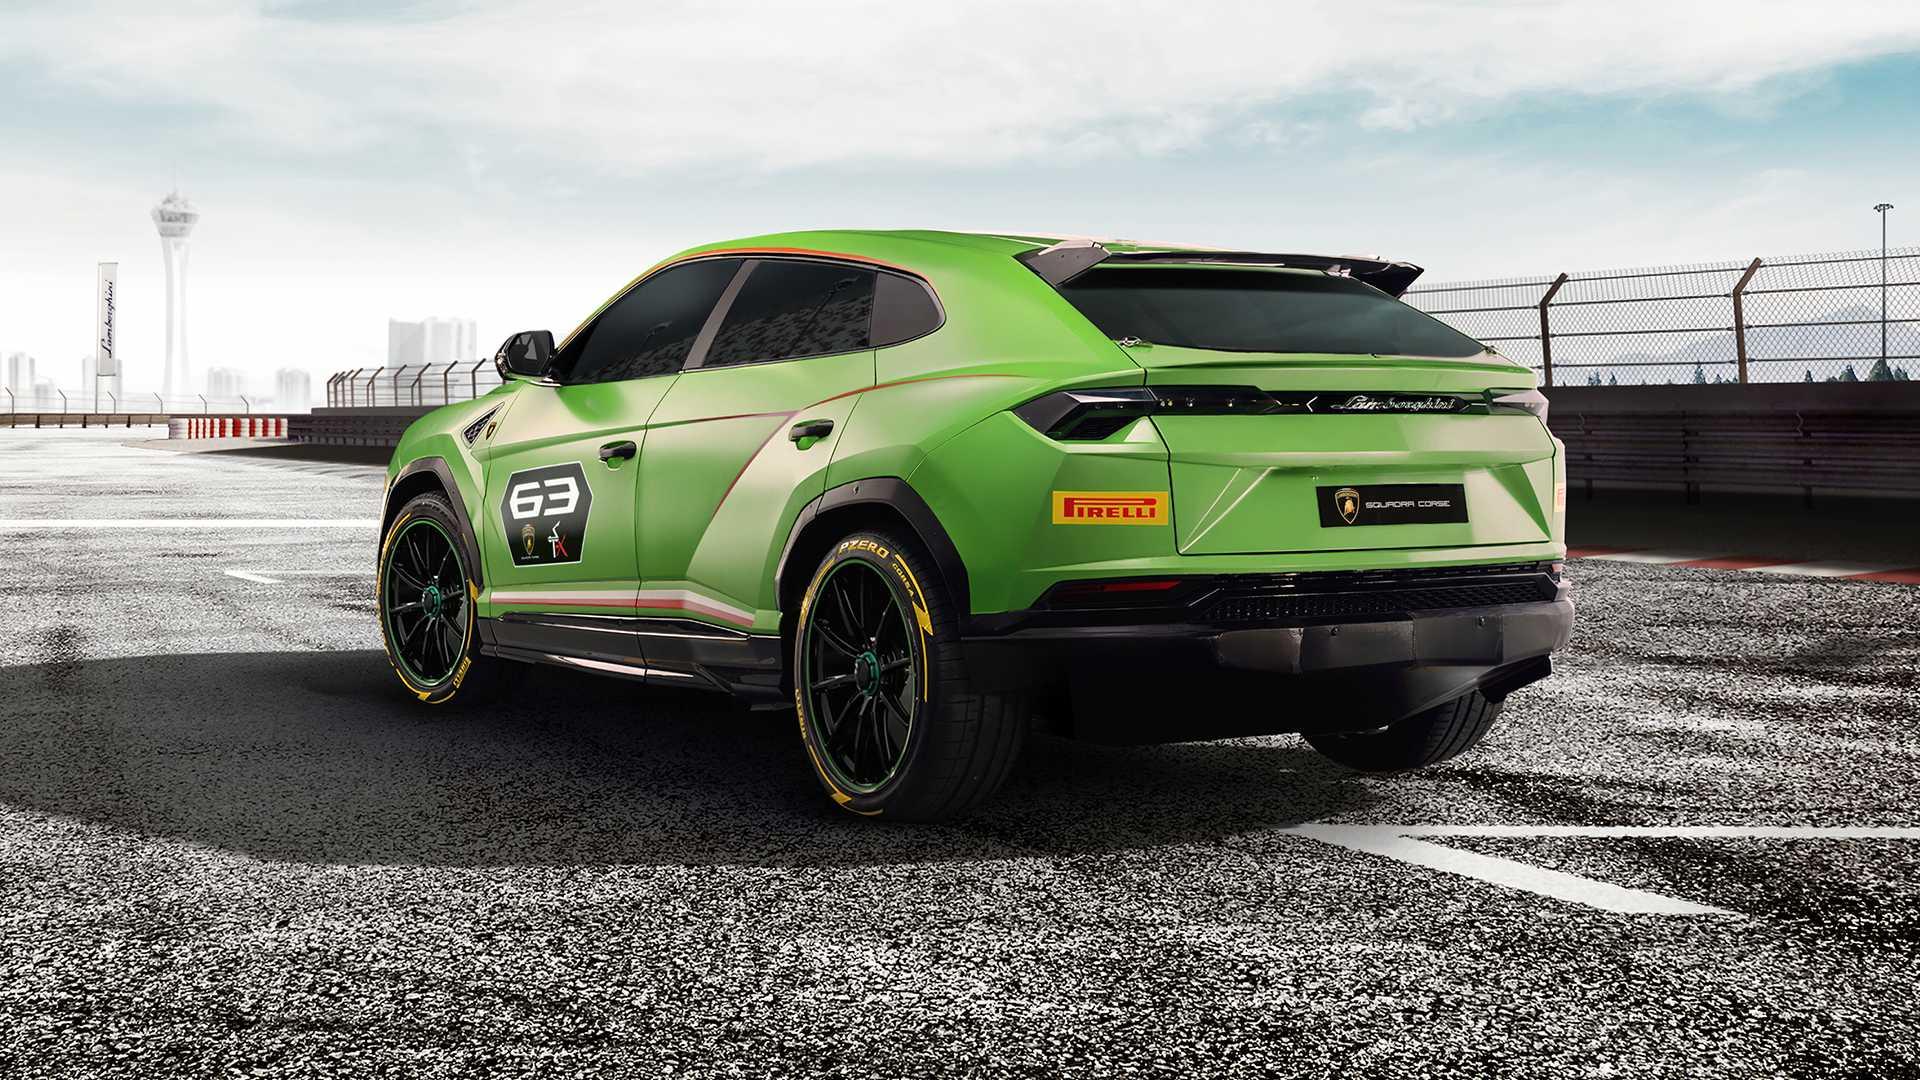 Lamborghini сделала гоночный кроссовер Urus ST-X 3